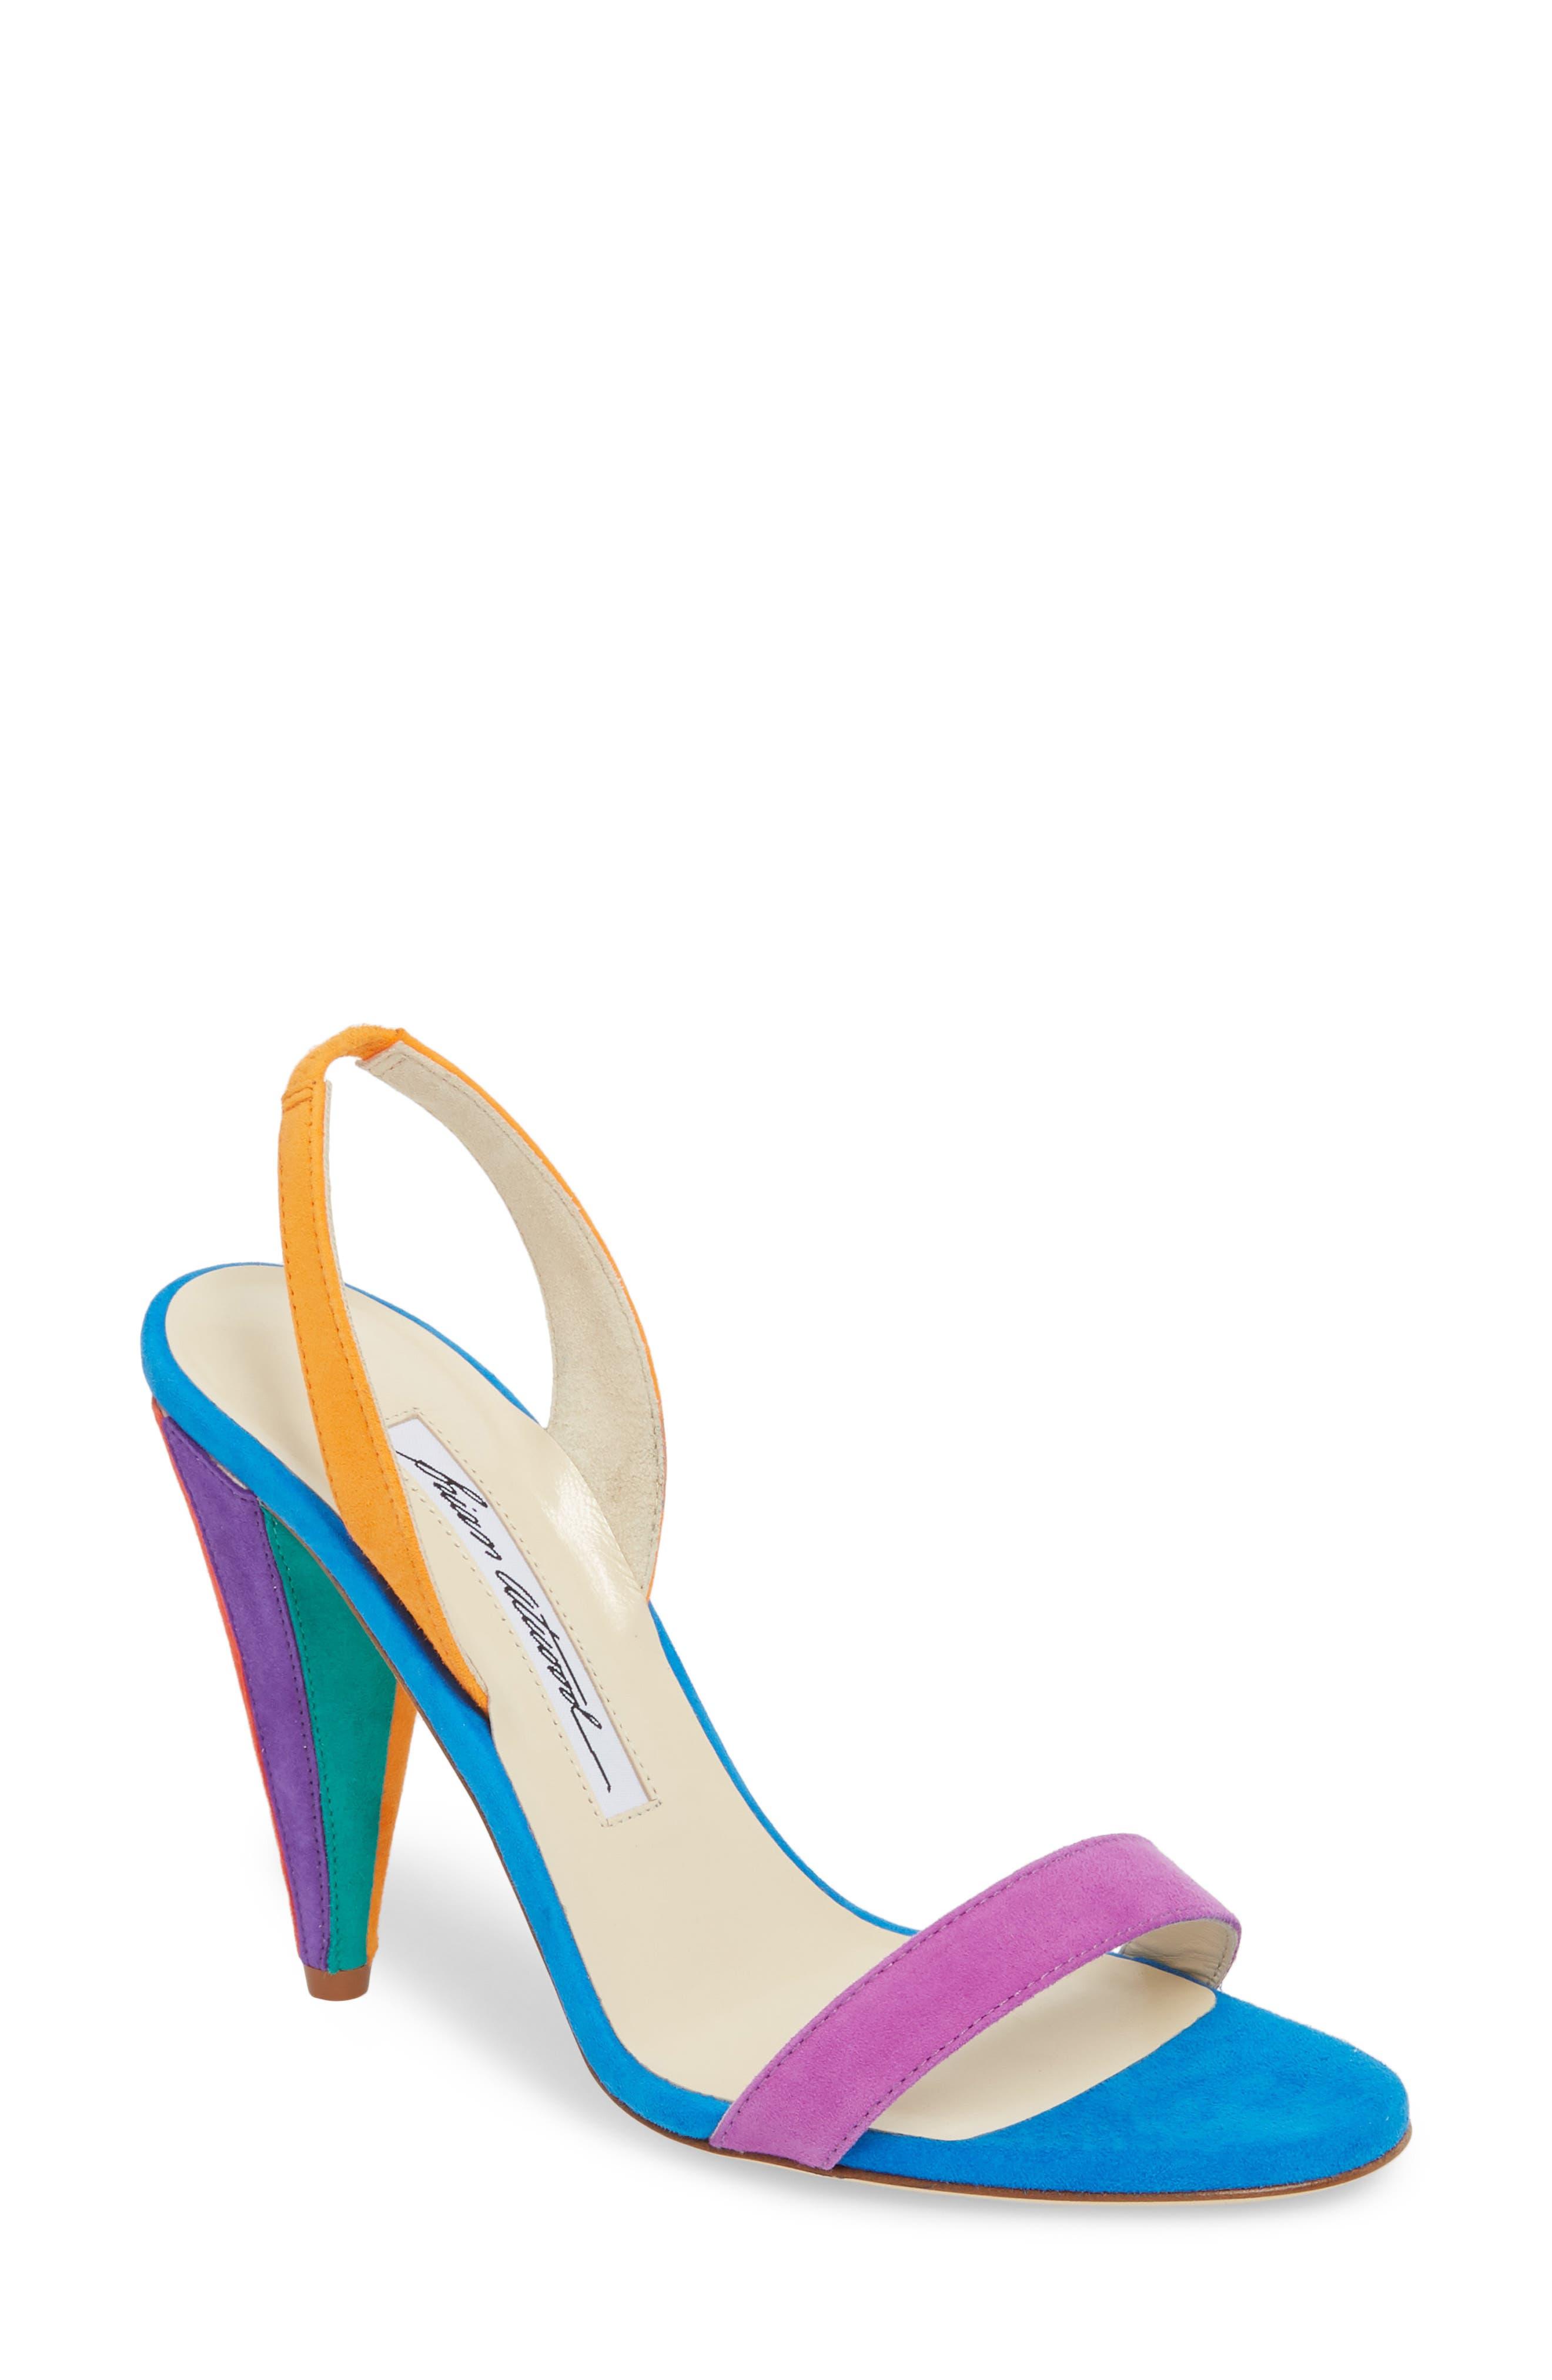 Susii Cone Heel Sandal,                         Main,                         color, 400